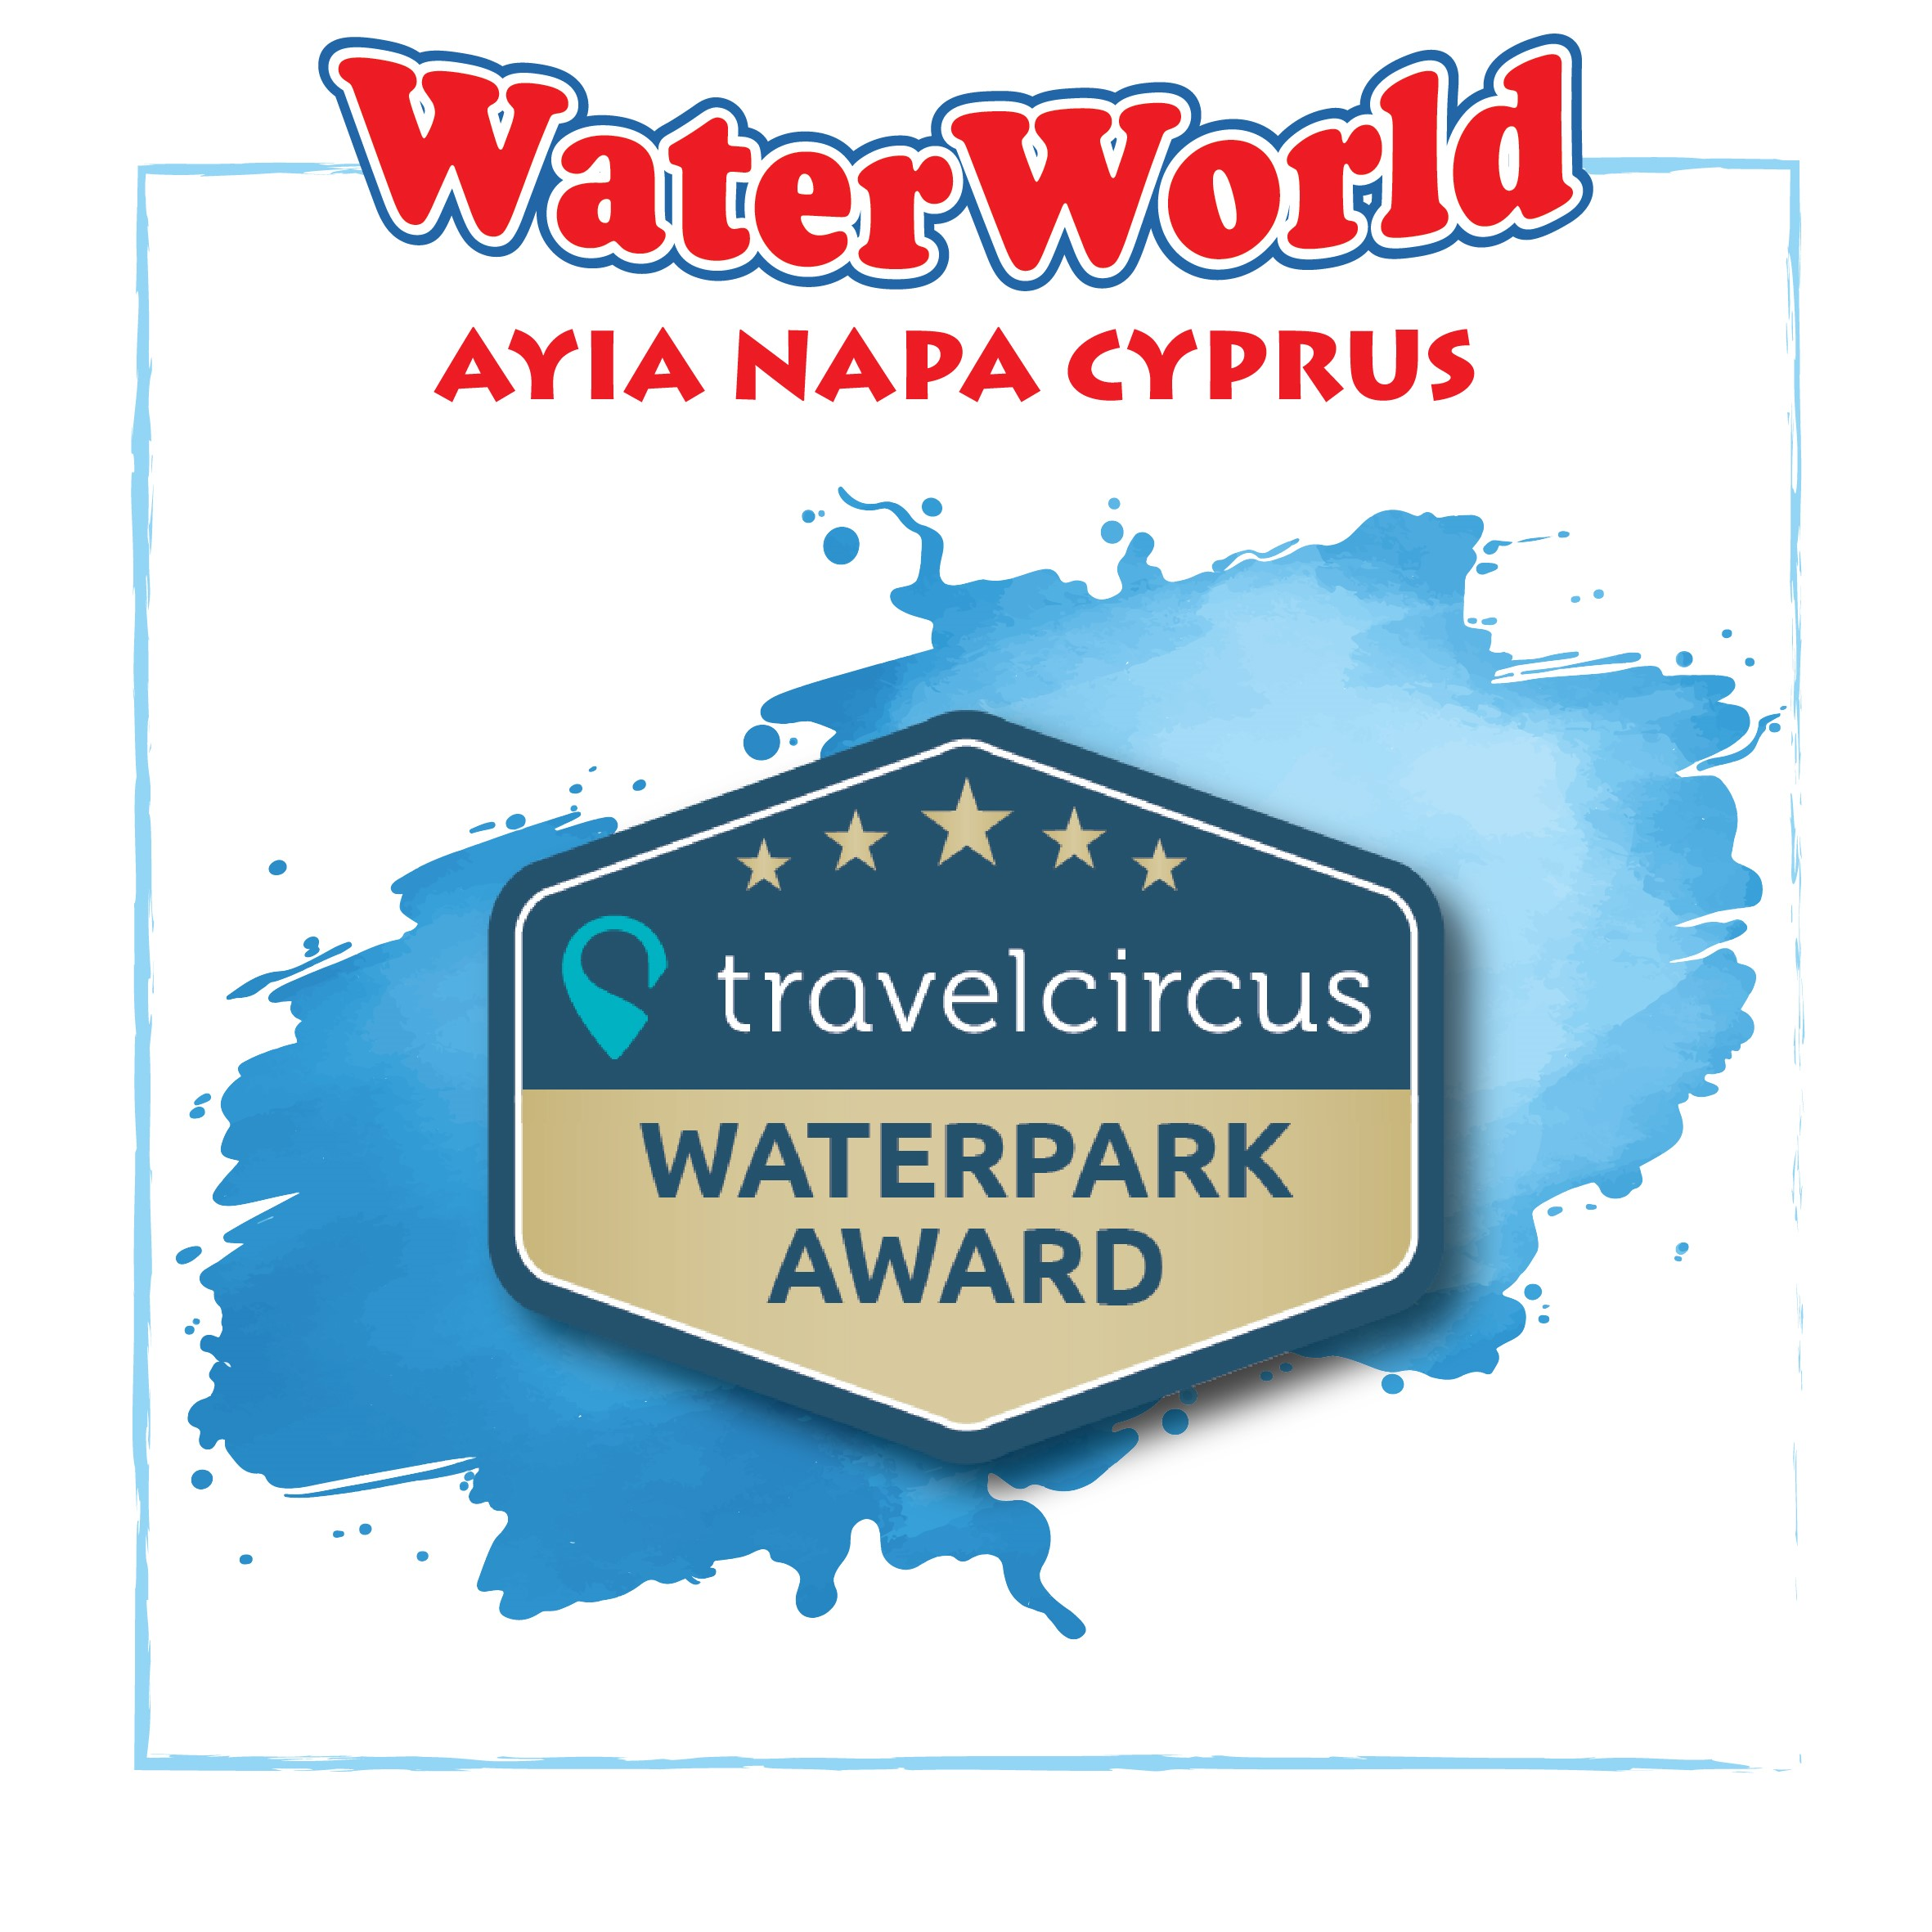 WaterWorld Themed Waterpark Wins Another Award